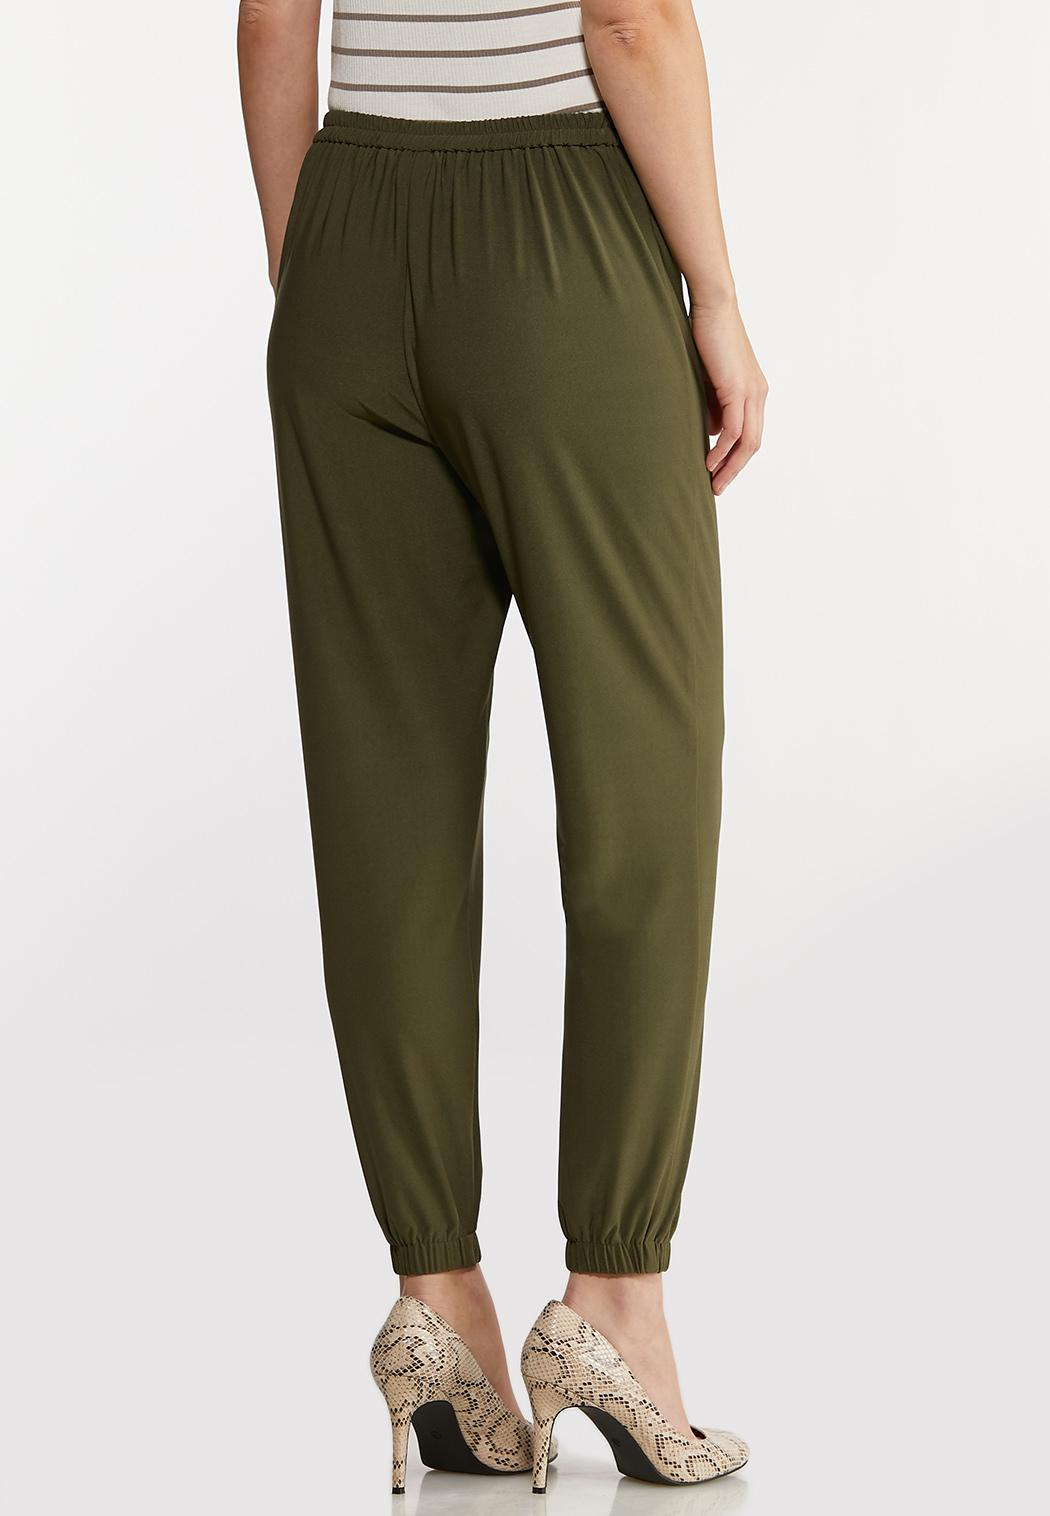 Petite Olive Dressy Joggers (Item #44135231)